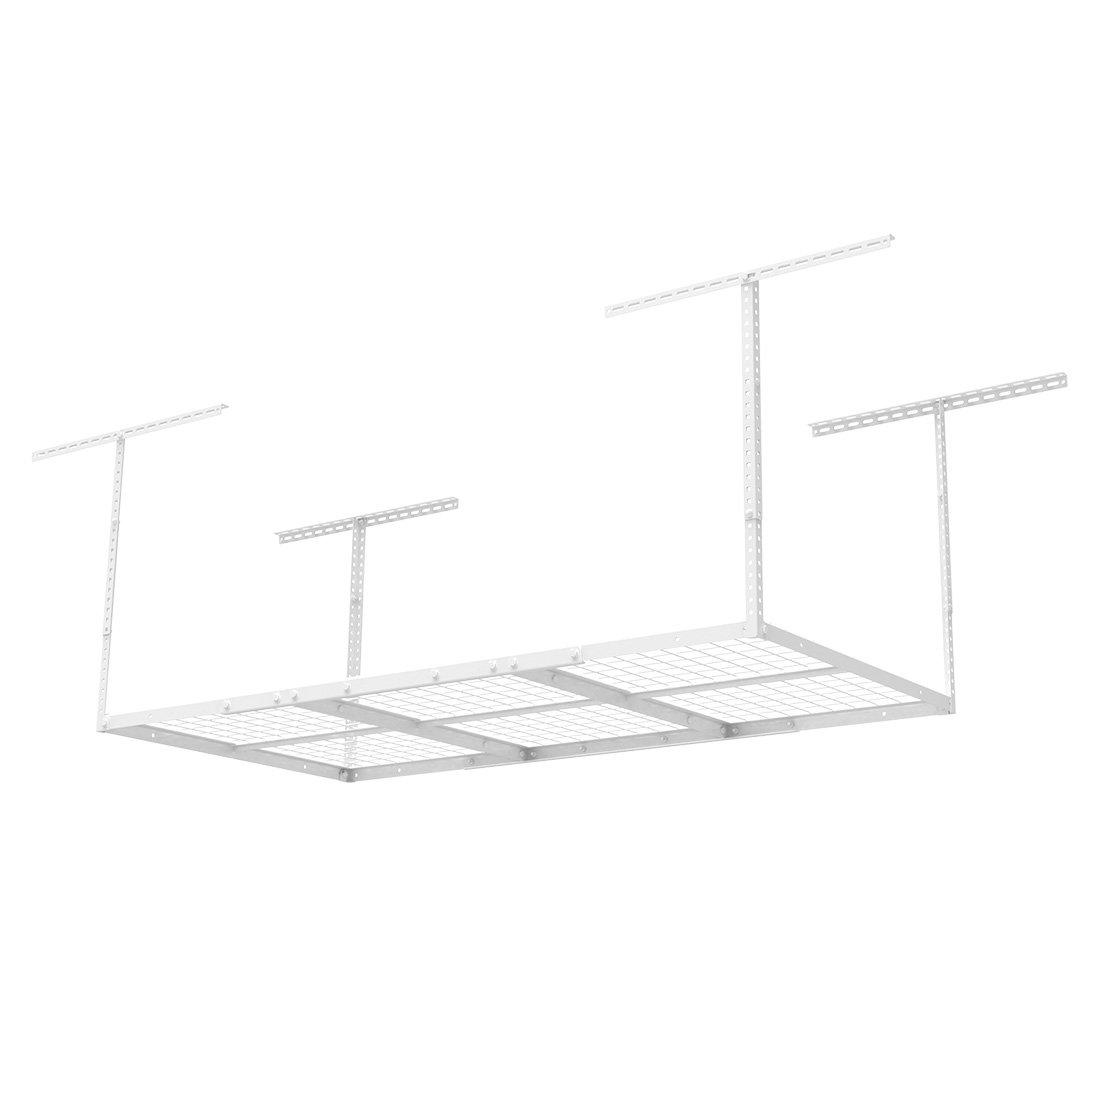 "FLEXIMOUNTS 3x6 Overhead Garage Storage Adjustable Ceiling Storage Rack, 72"" Length x 36"" Width x 40"" Height (white)"